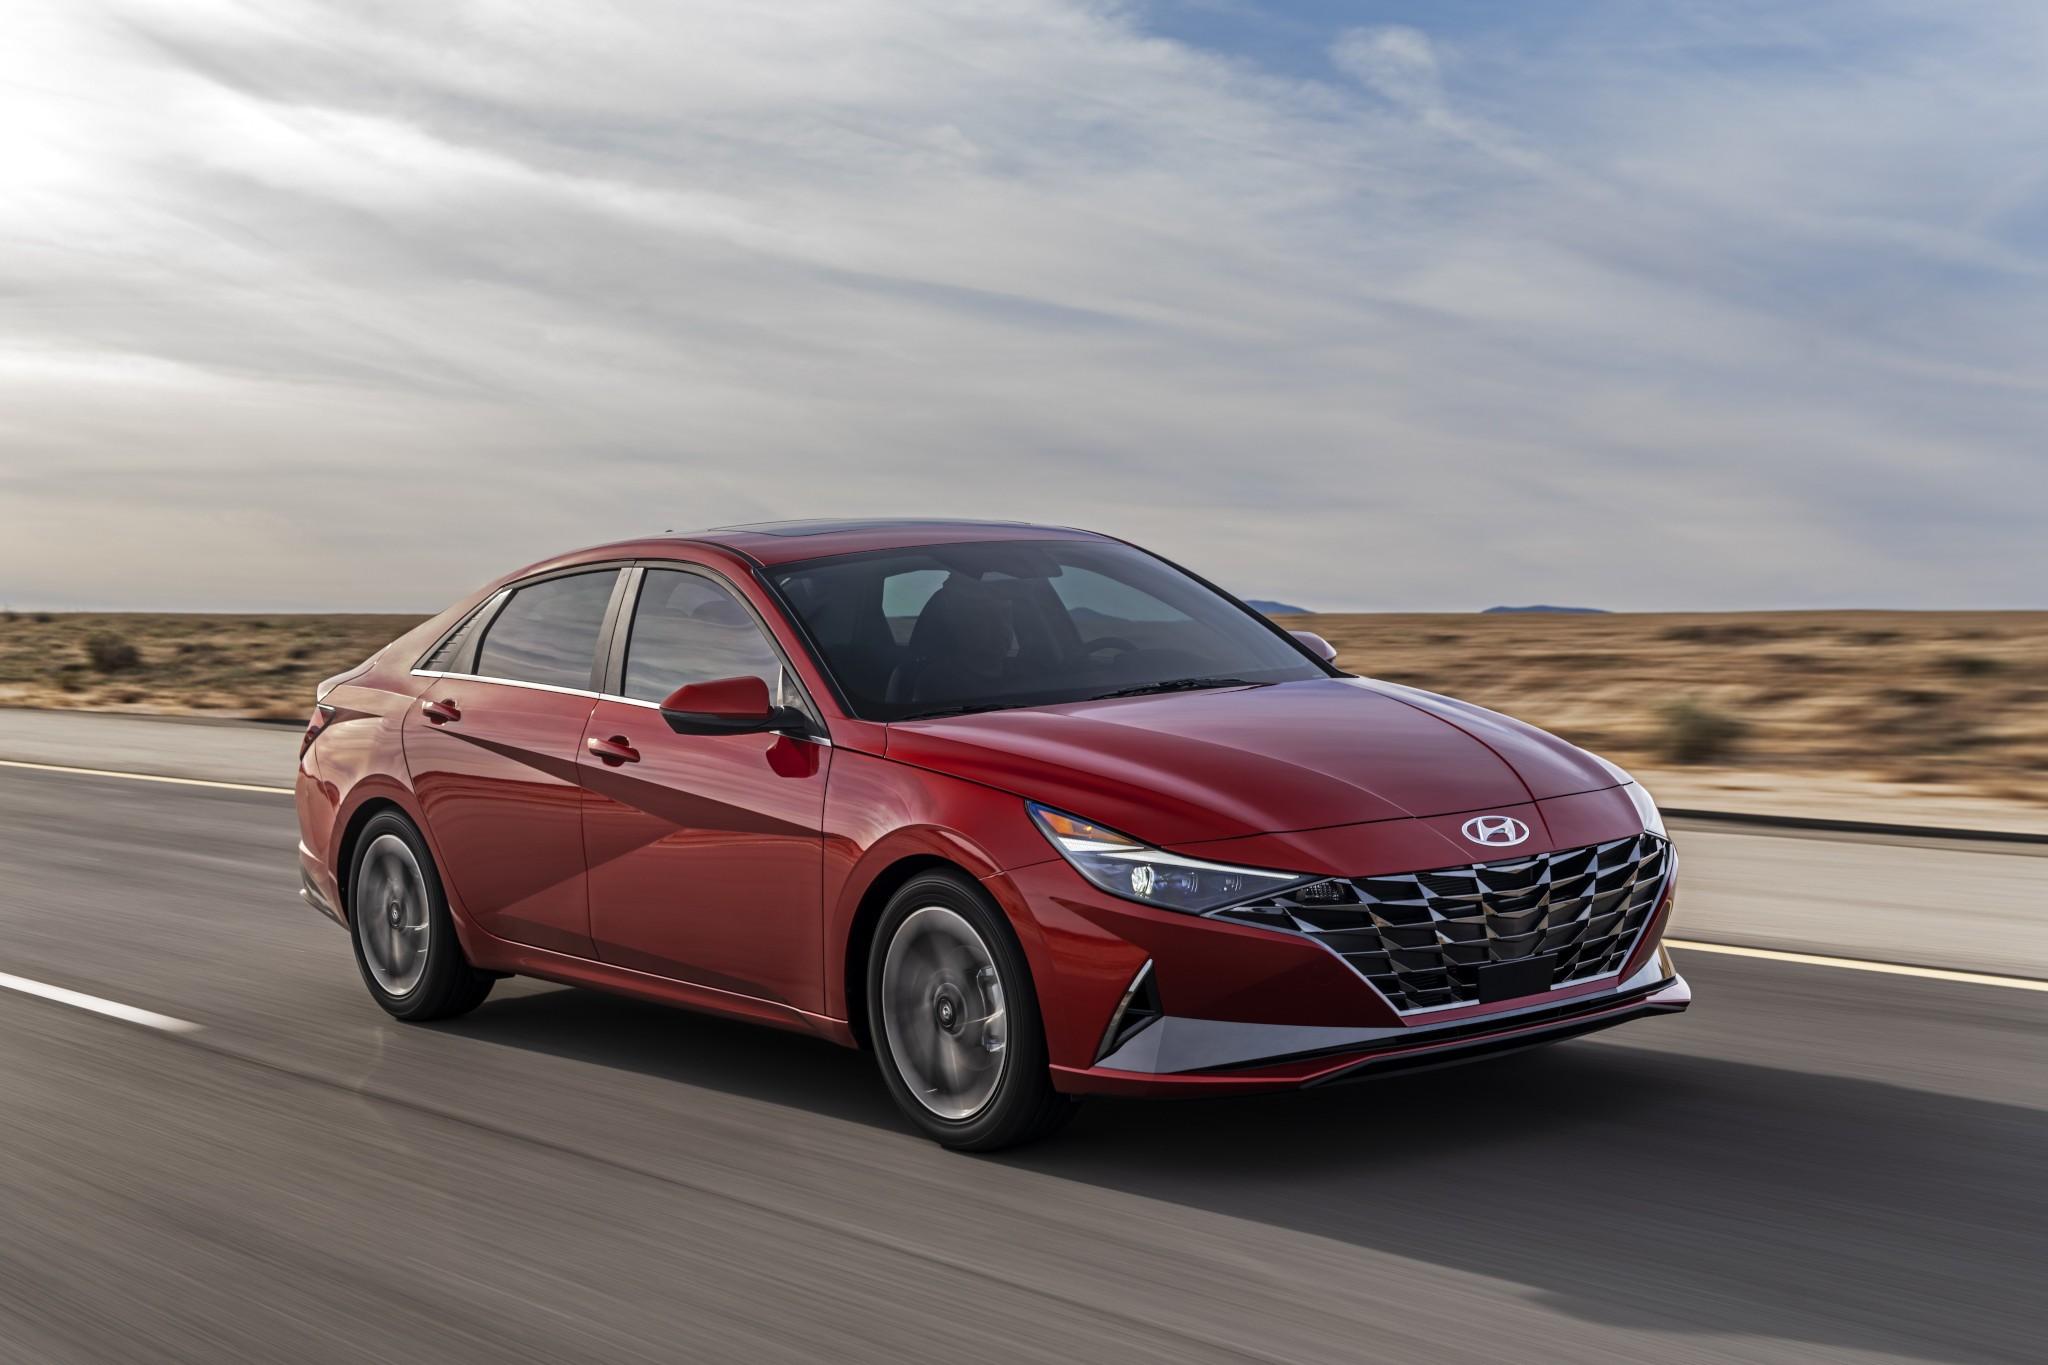 2021 Hyundai Elantra Brings High Tech, High Style, Hybrid